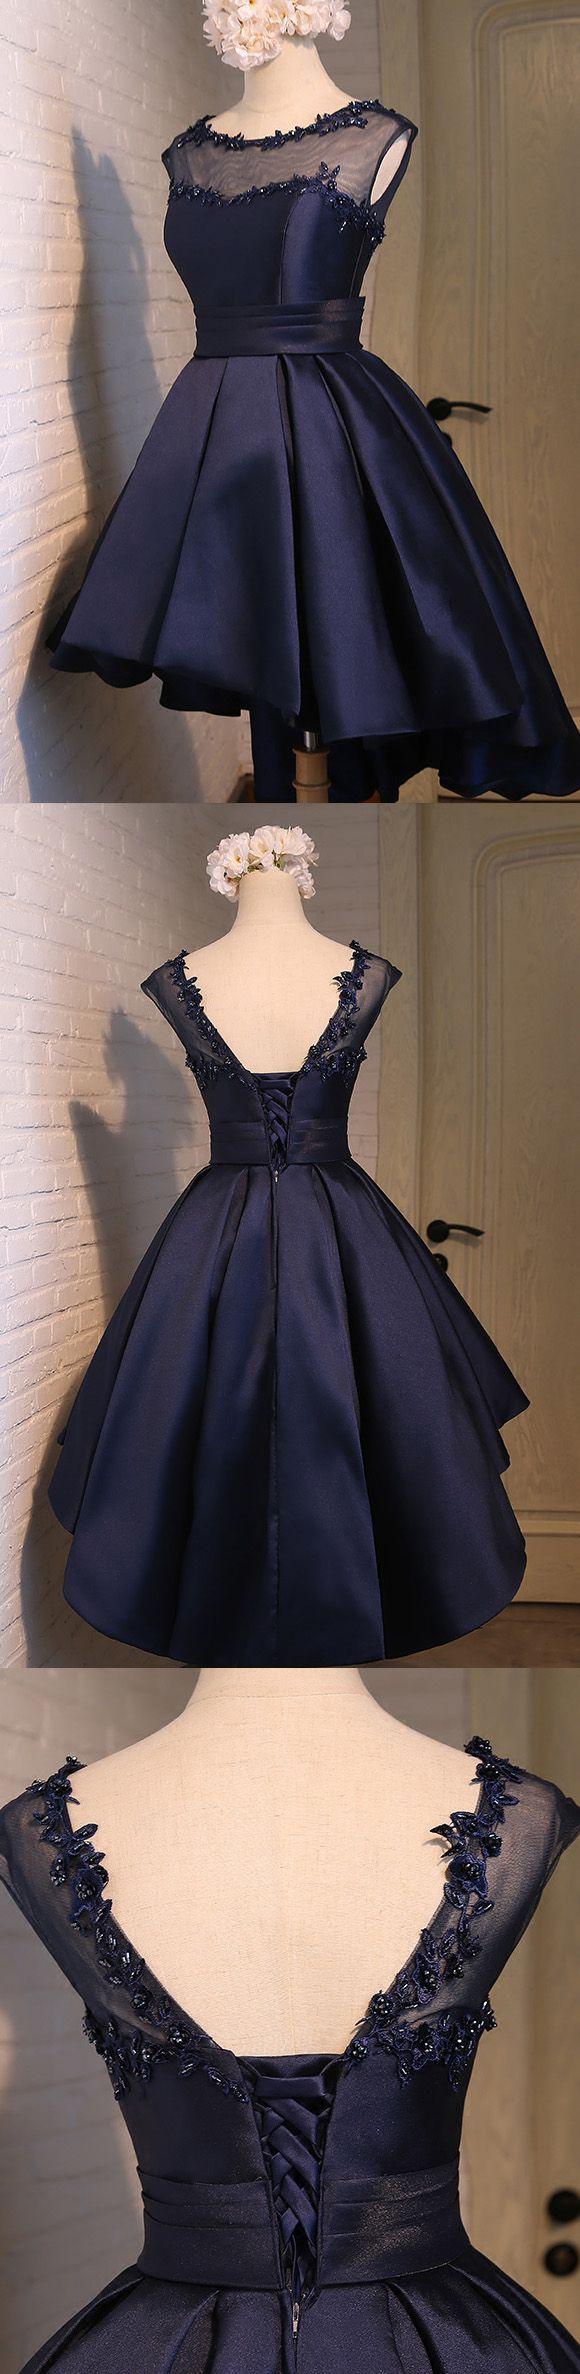 Navy homecoming dresses short prom dresses homecoming dress